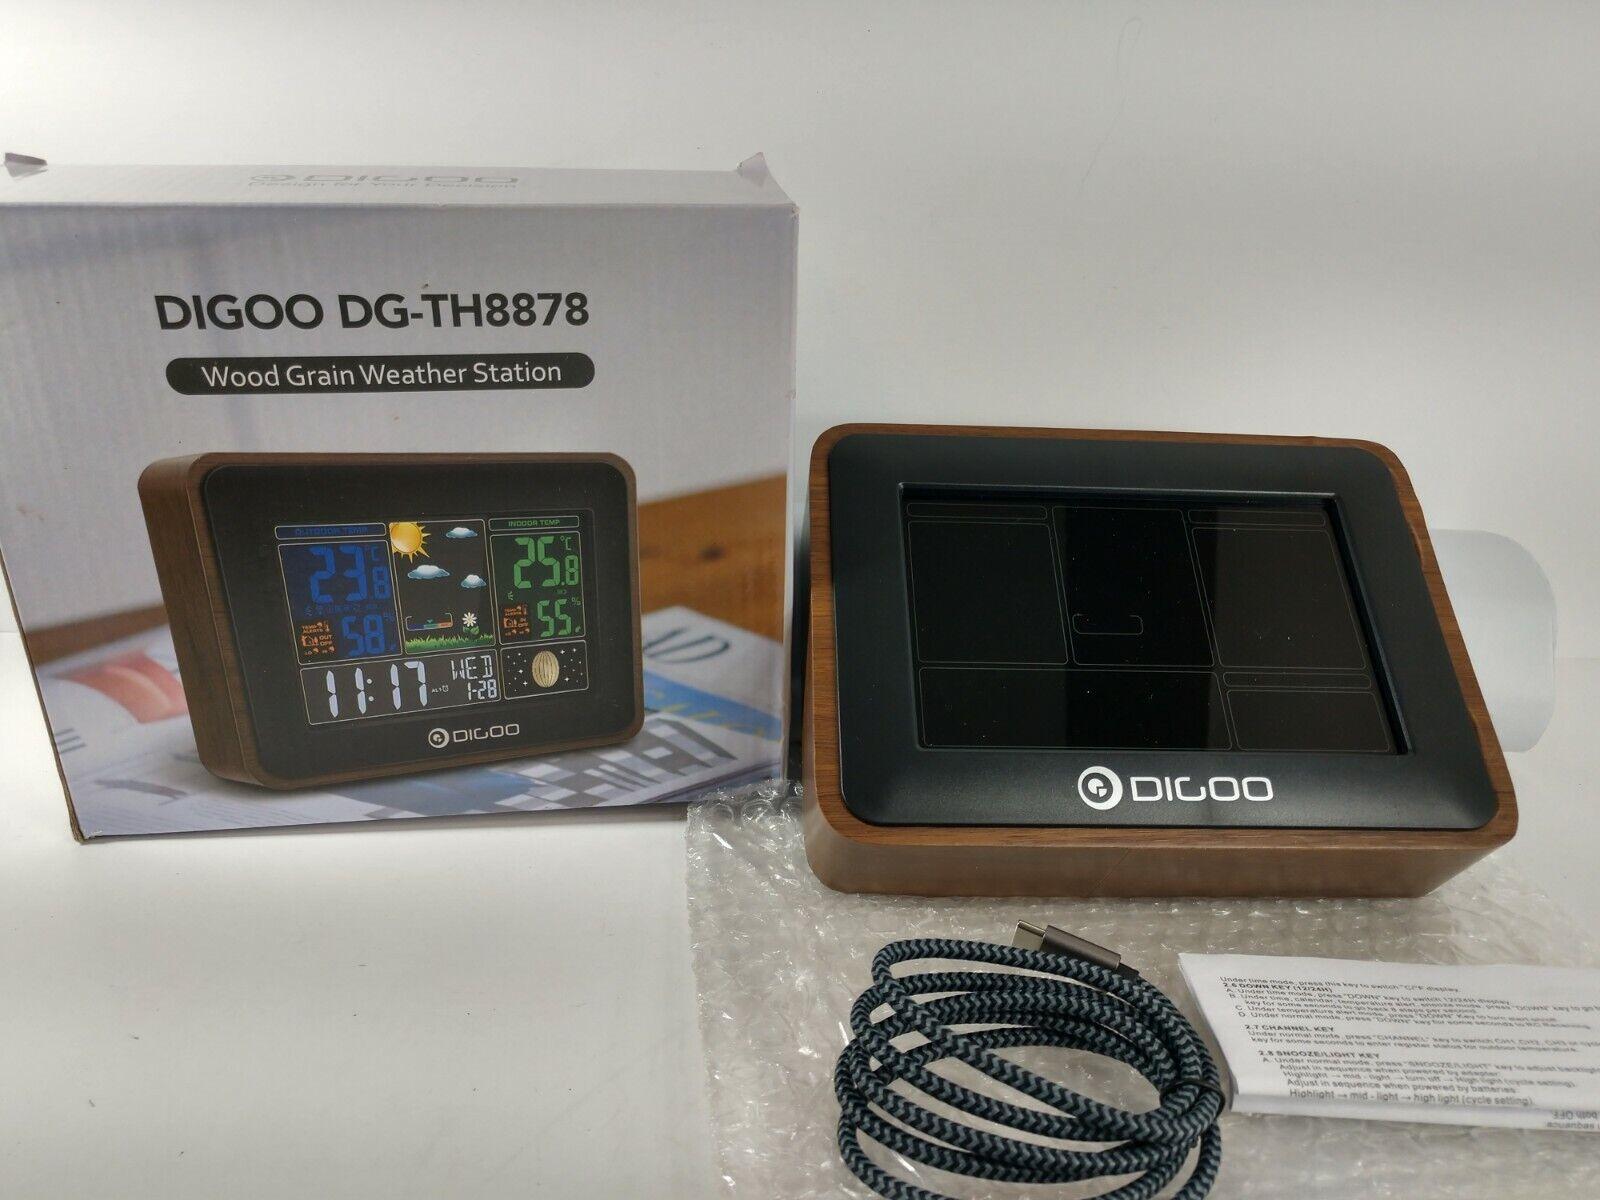 Outdoor Forecast  ☆NEW OL3 Digoo DG-TH8380 Wireless Weather Station